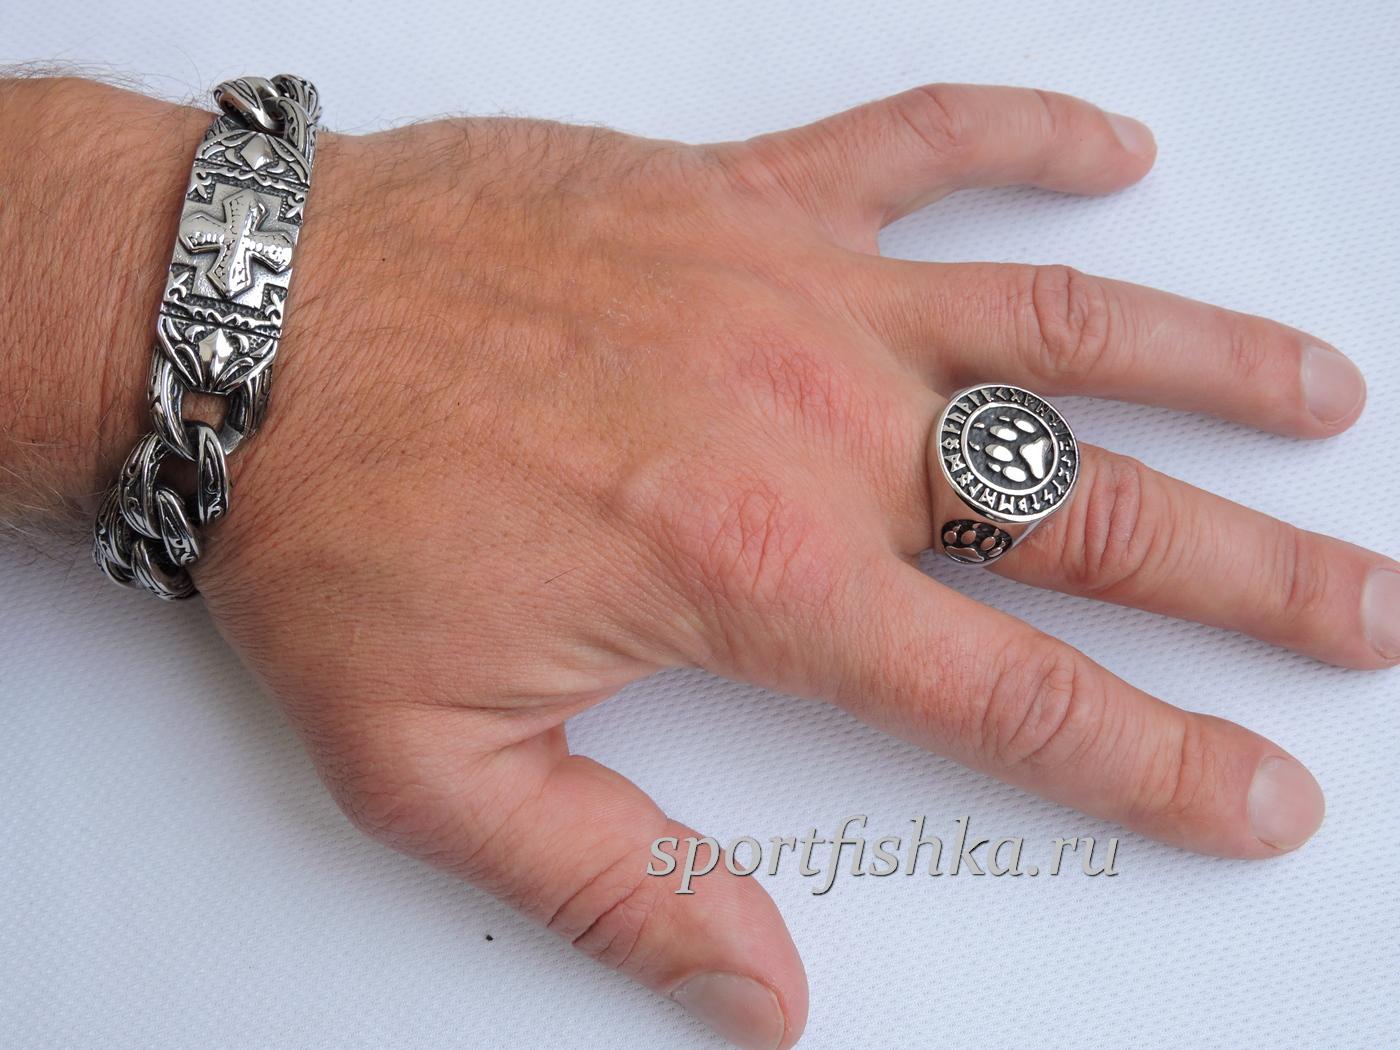 Кольцо из стали лапа медведя на пальце